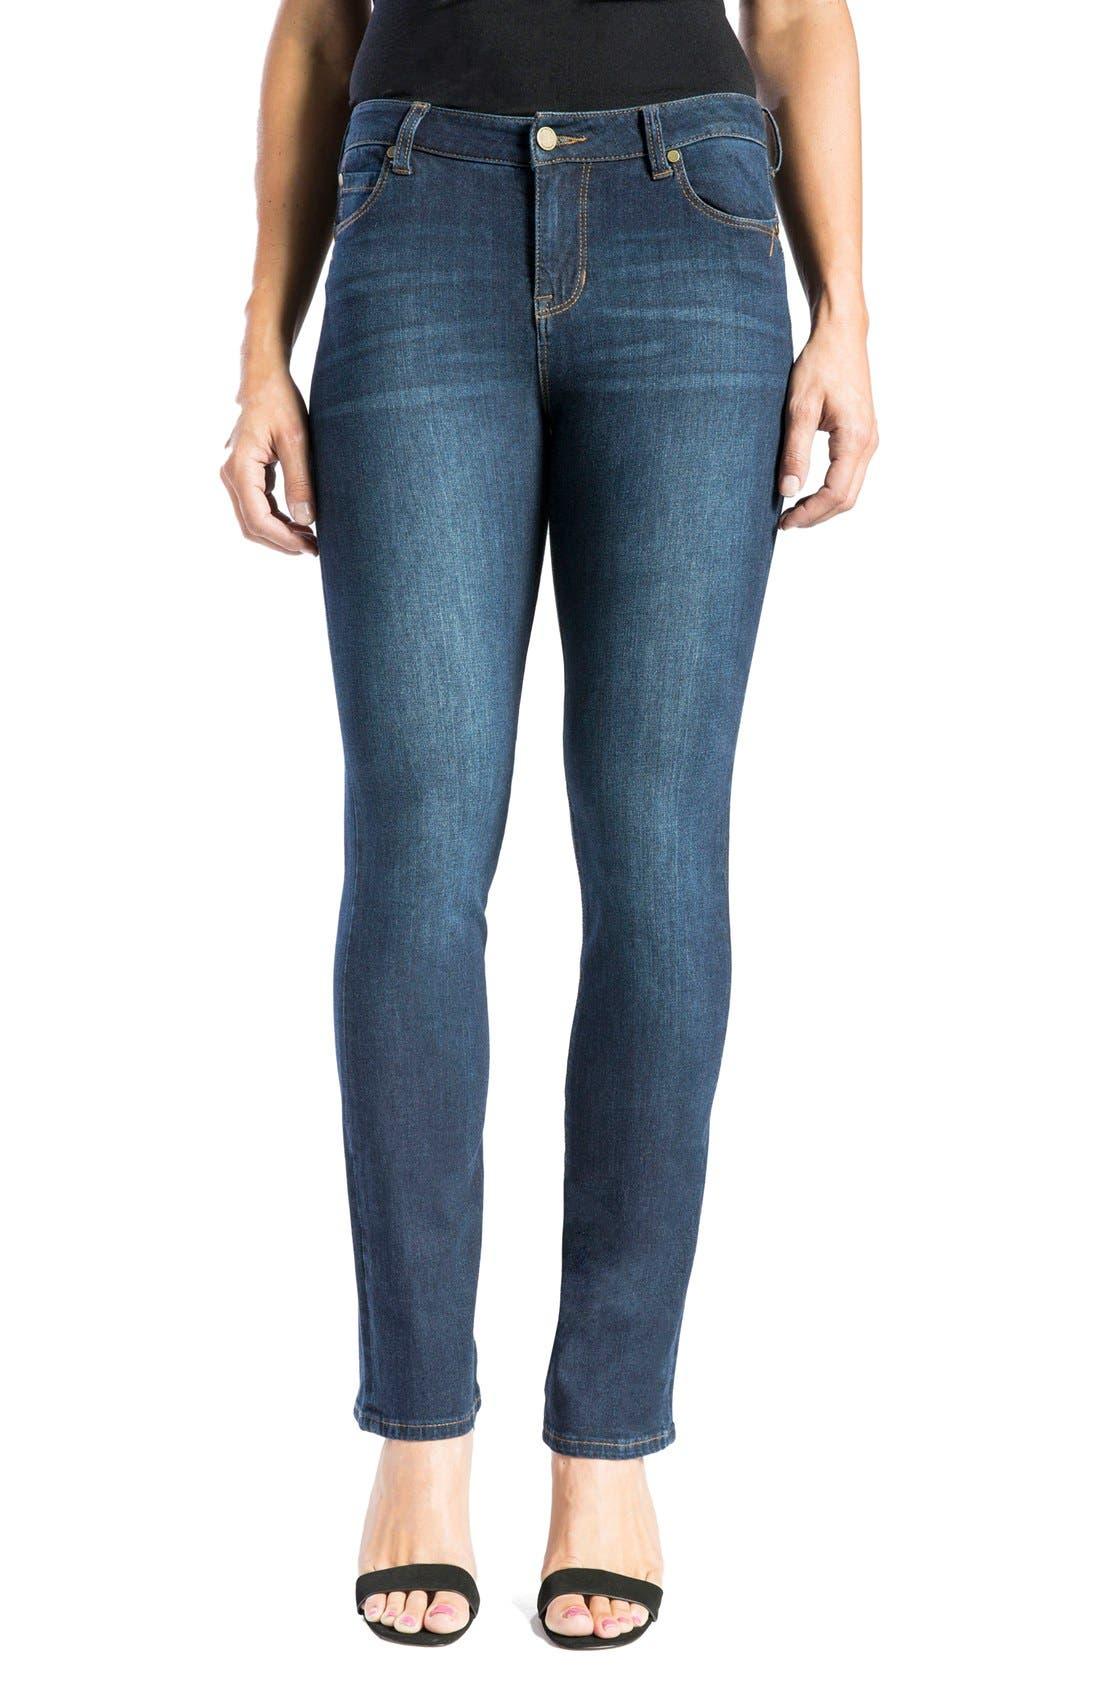 Main Image - Liverpool Jeans Company 'Remy - Hugger' Straight Leg Jeans (Corvus)